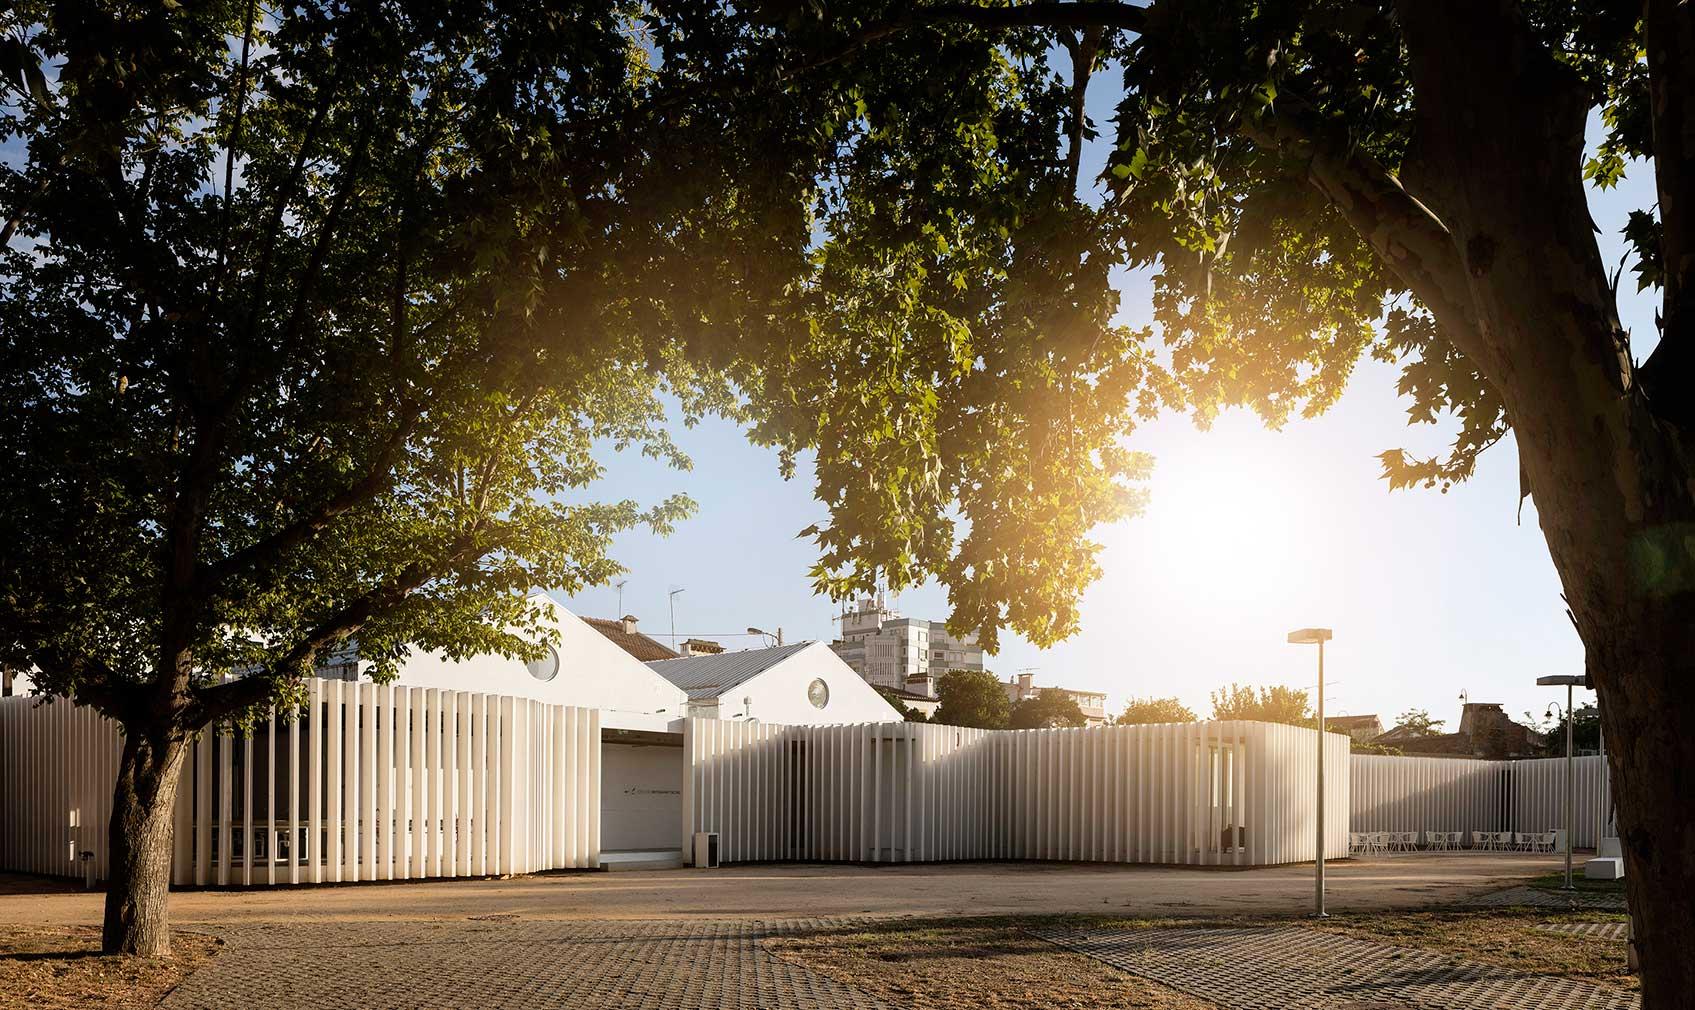 Abrantes campsite by Portuguese architecture practice Atelier Rua